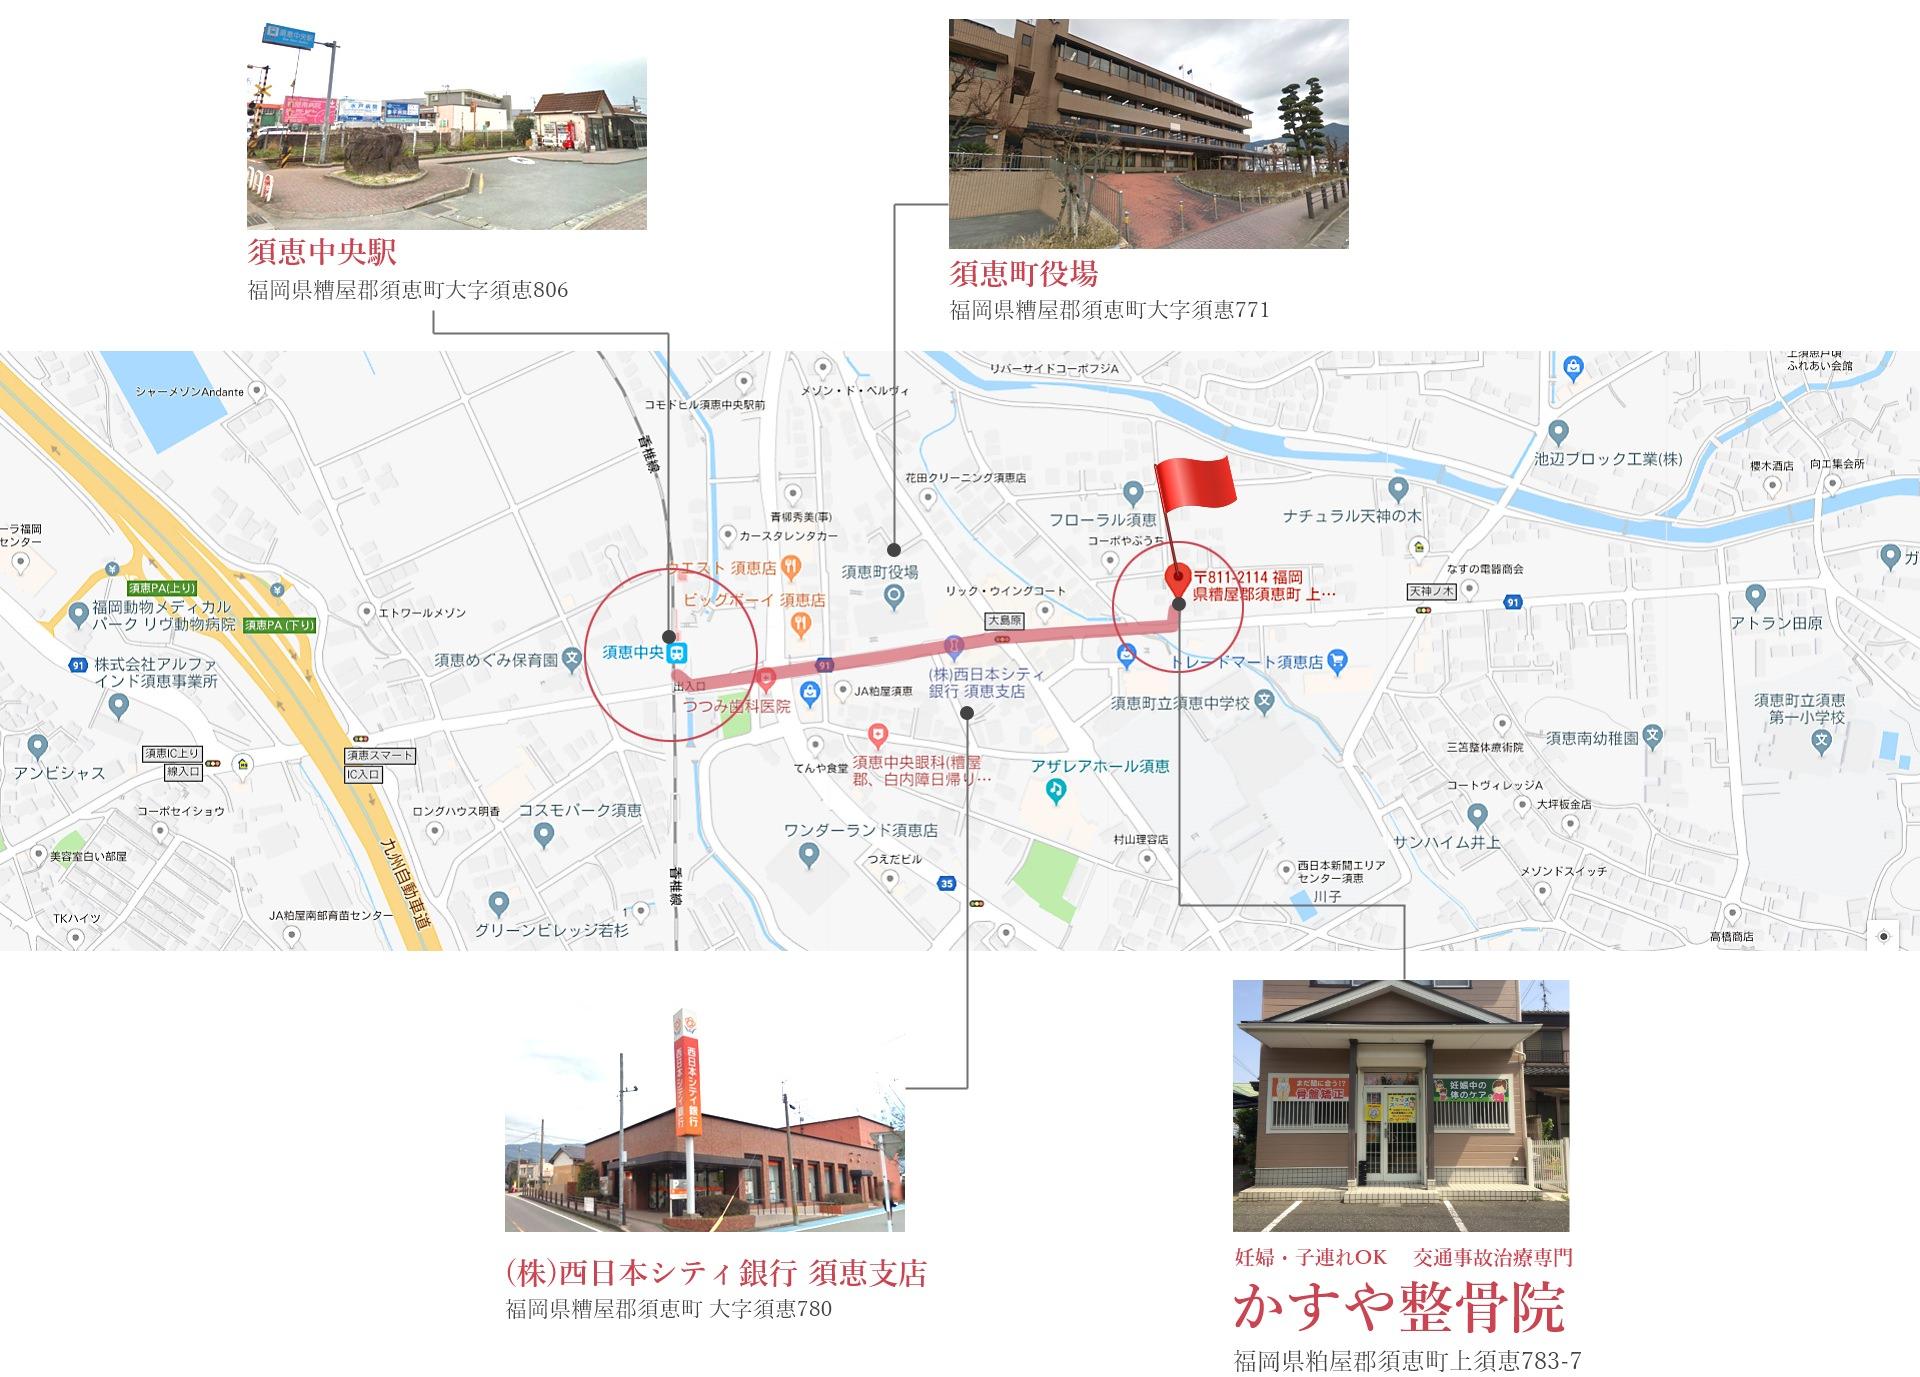 ルートガイド 須恵中央駅 - 須恵町役場- 西日本シティ銀行 須恵支店